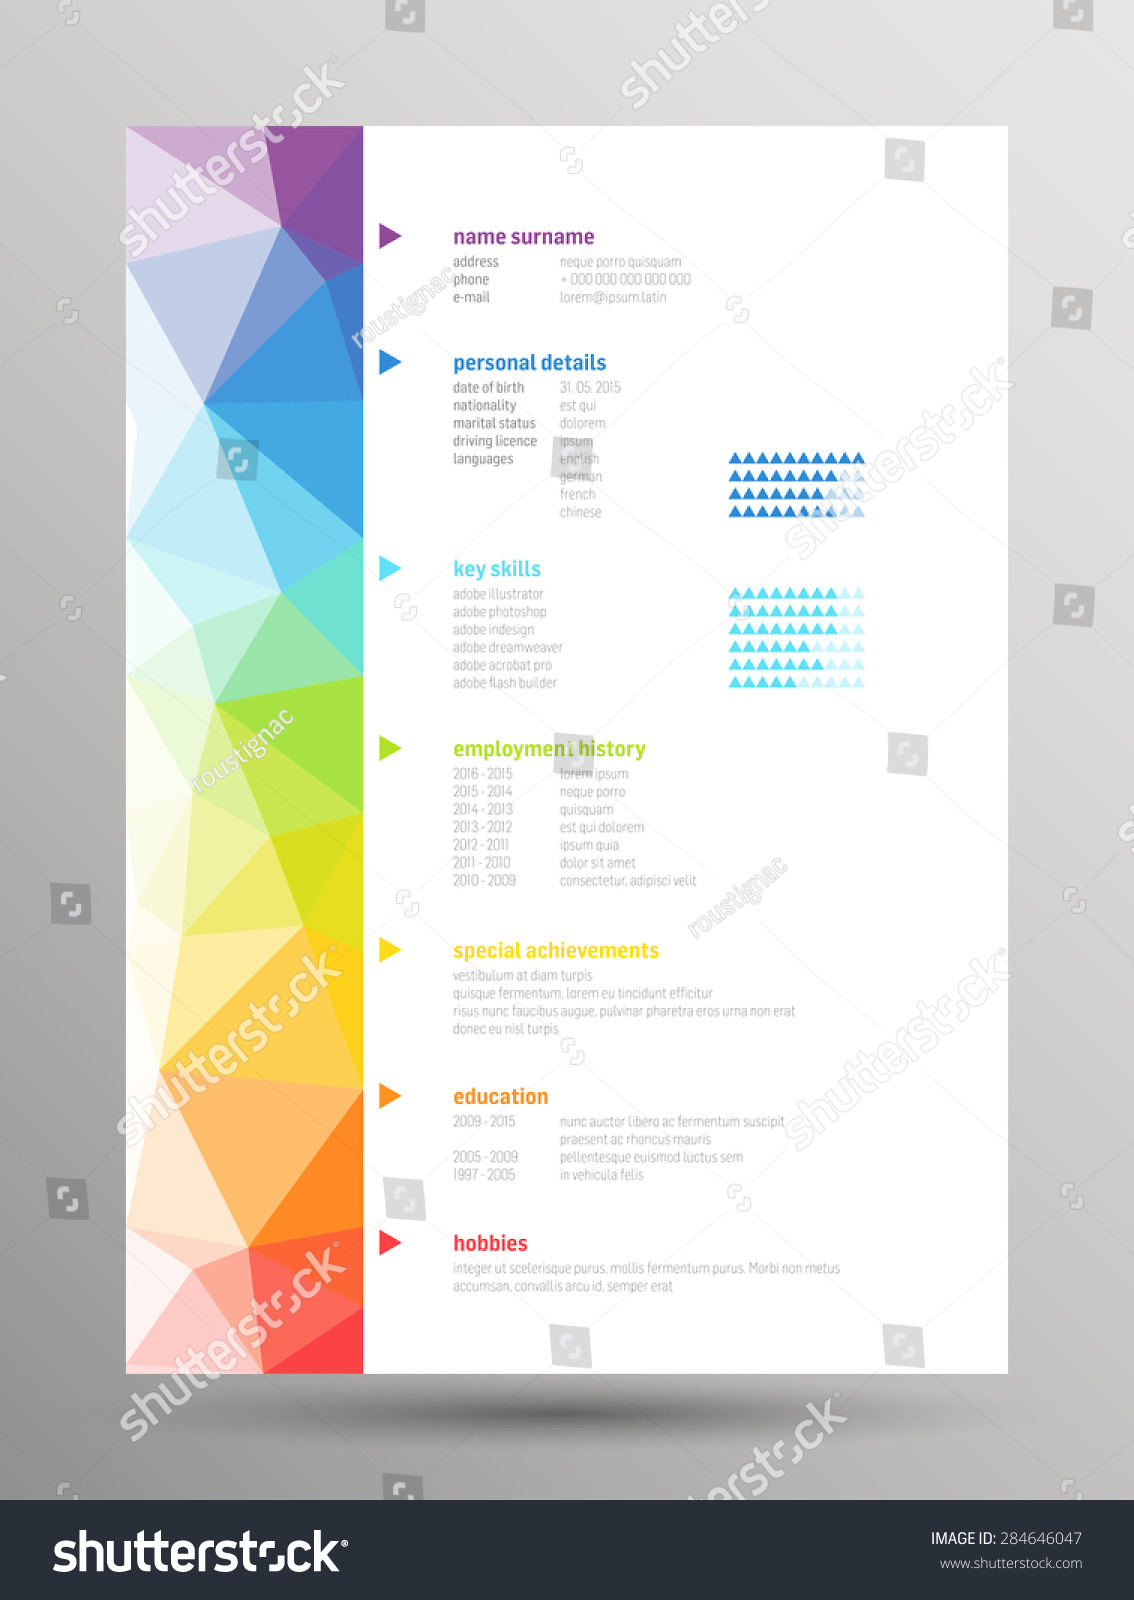 Resume Curriculum Vitae Low Poly Rainbow Vector de stock (libre de ...